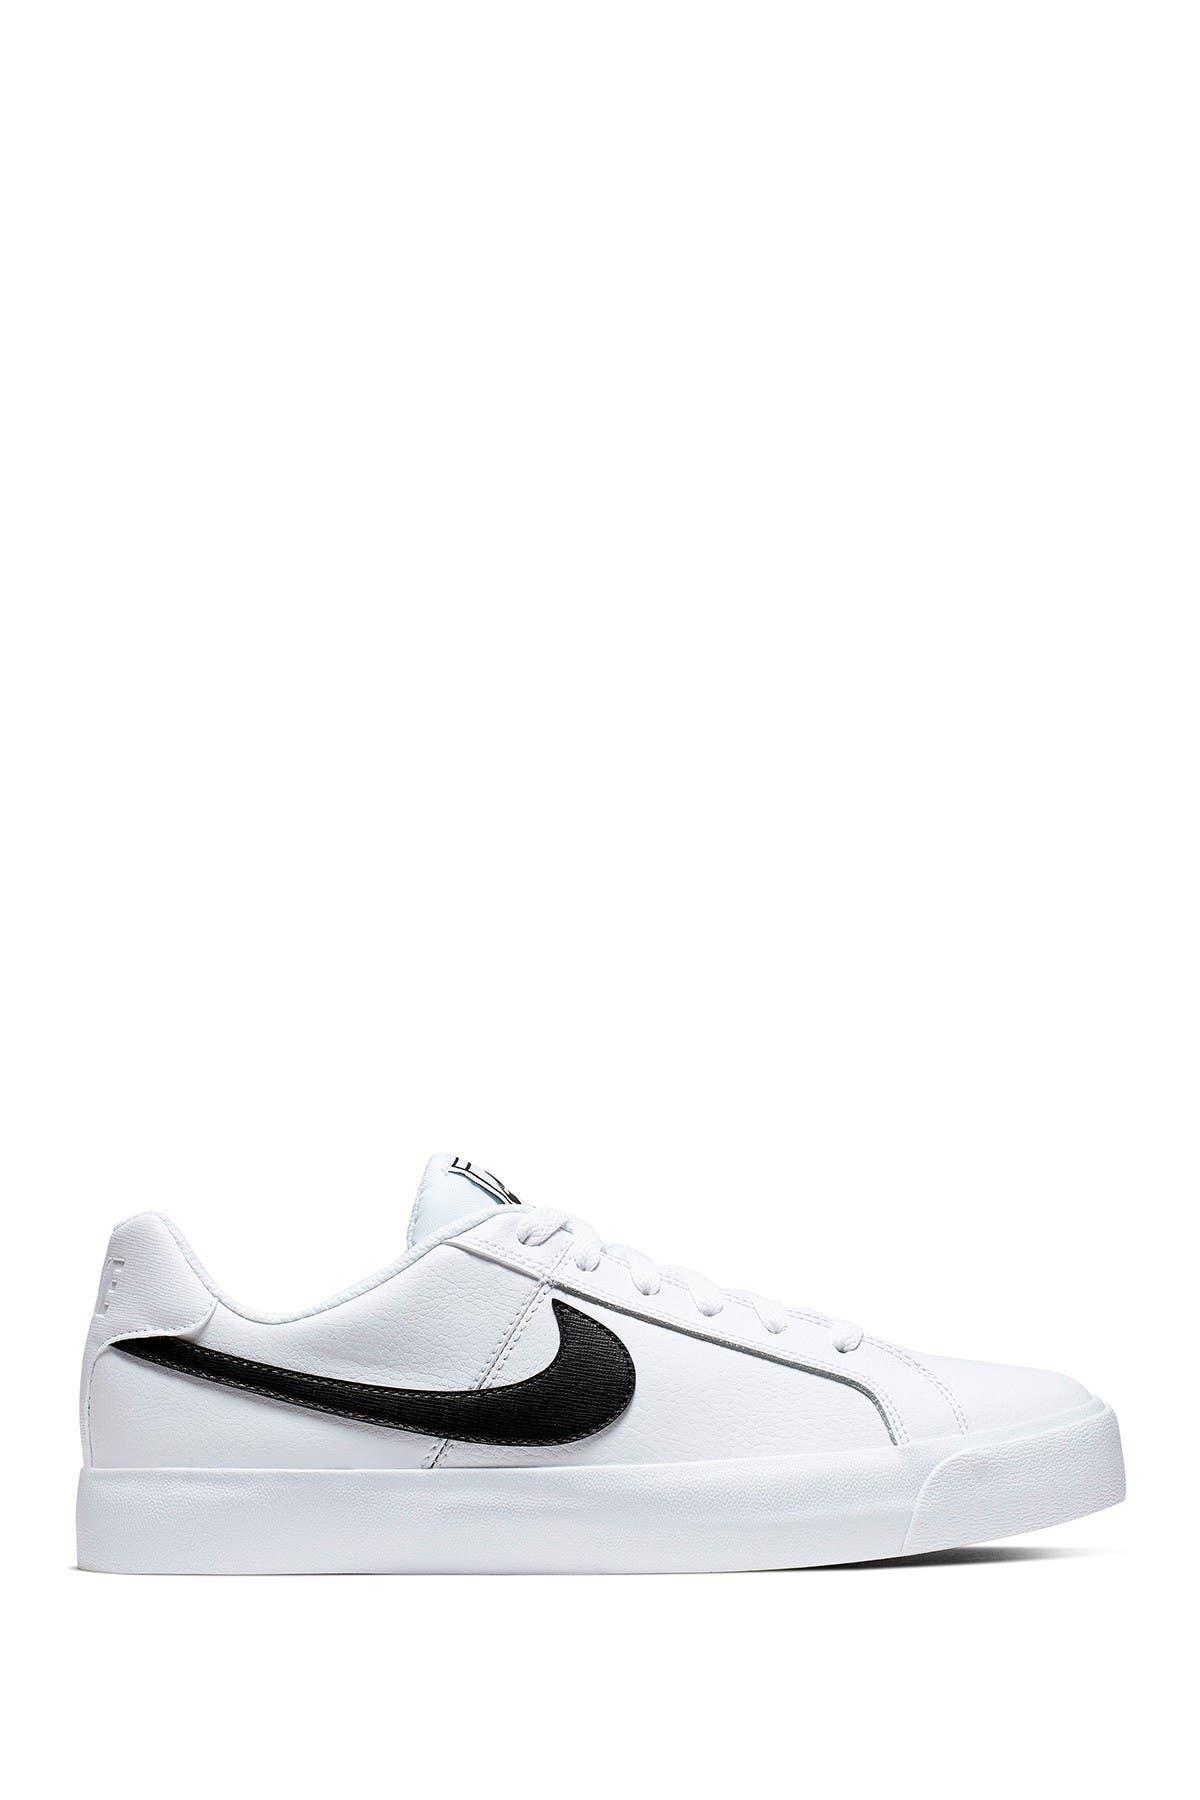 Nike | Court Royale Sneaker | Nordstrom